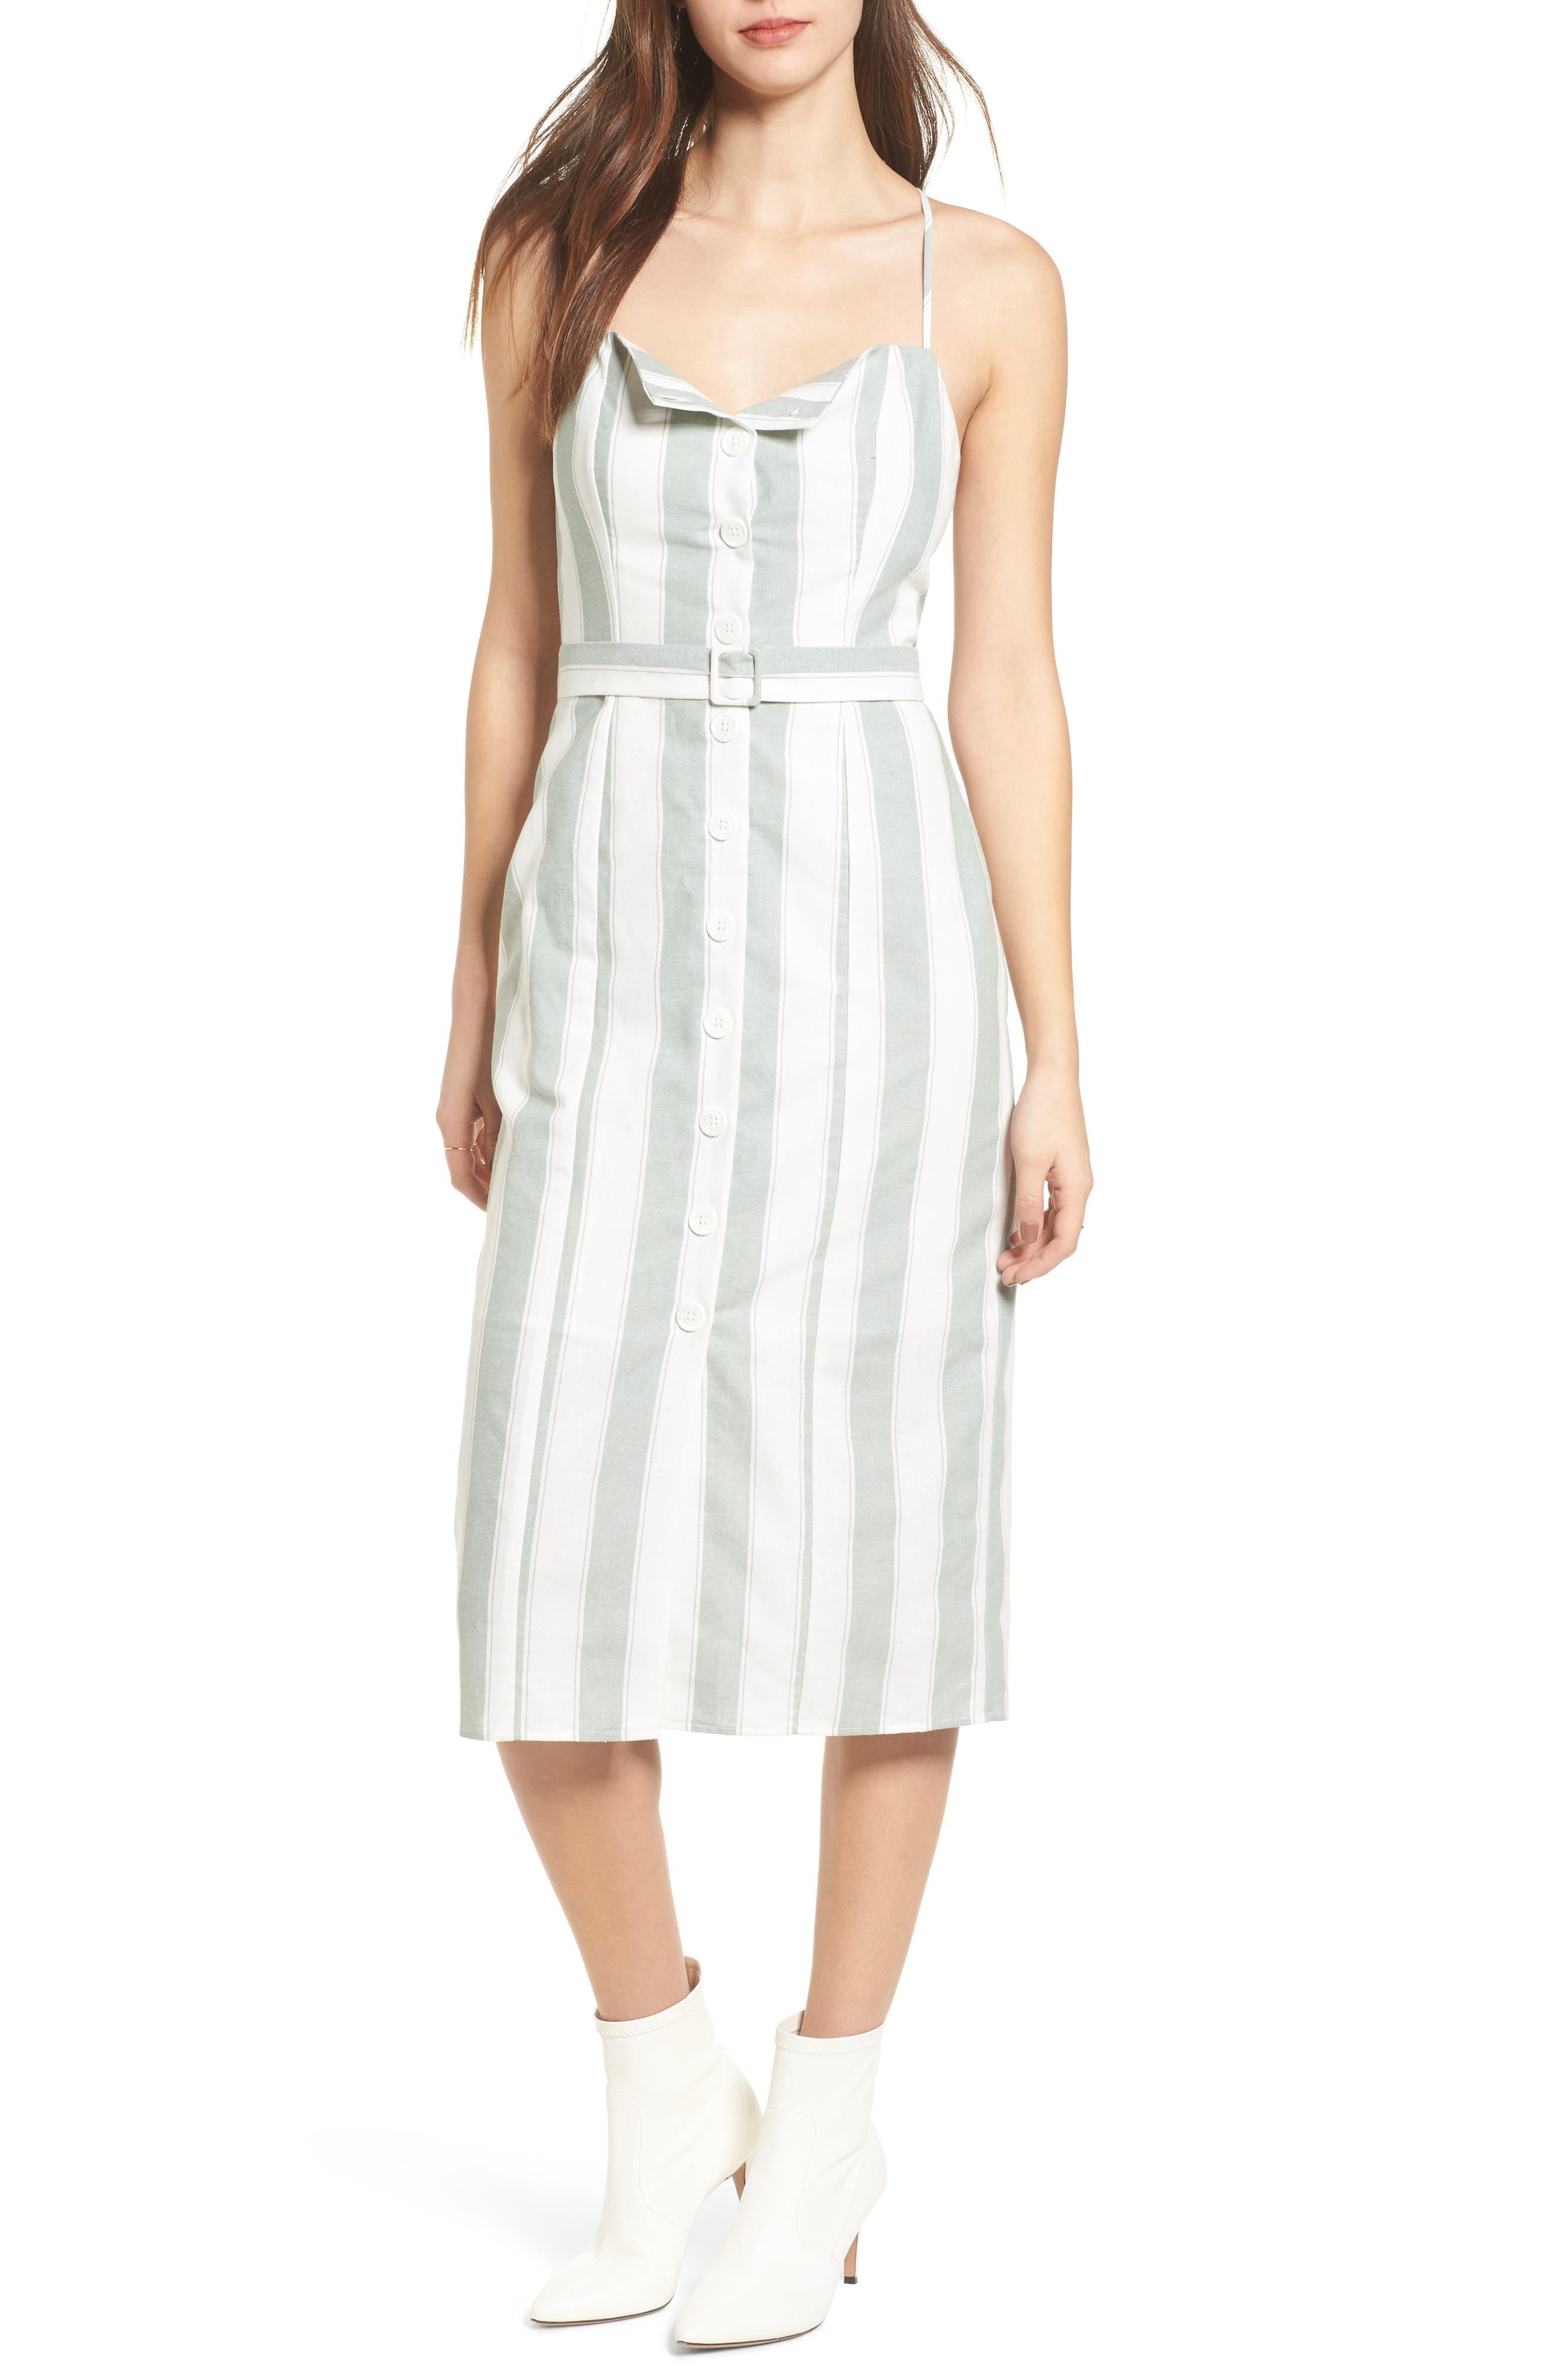 Poetic Stripe Sundress,                         Main,                         color, Sage W White